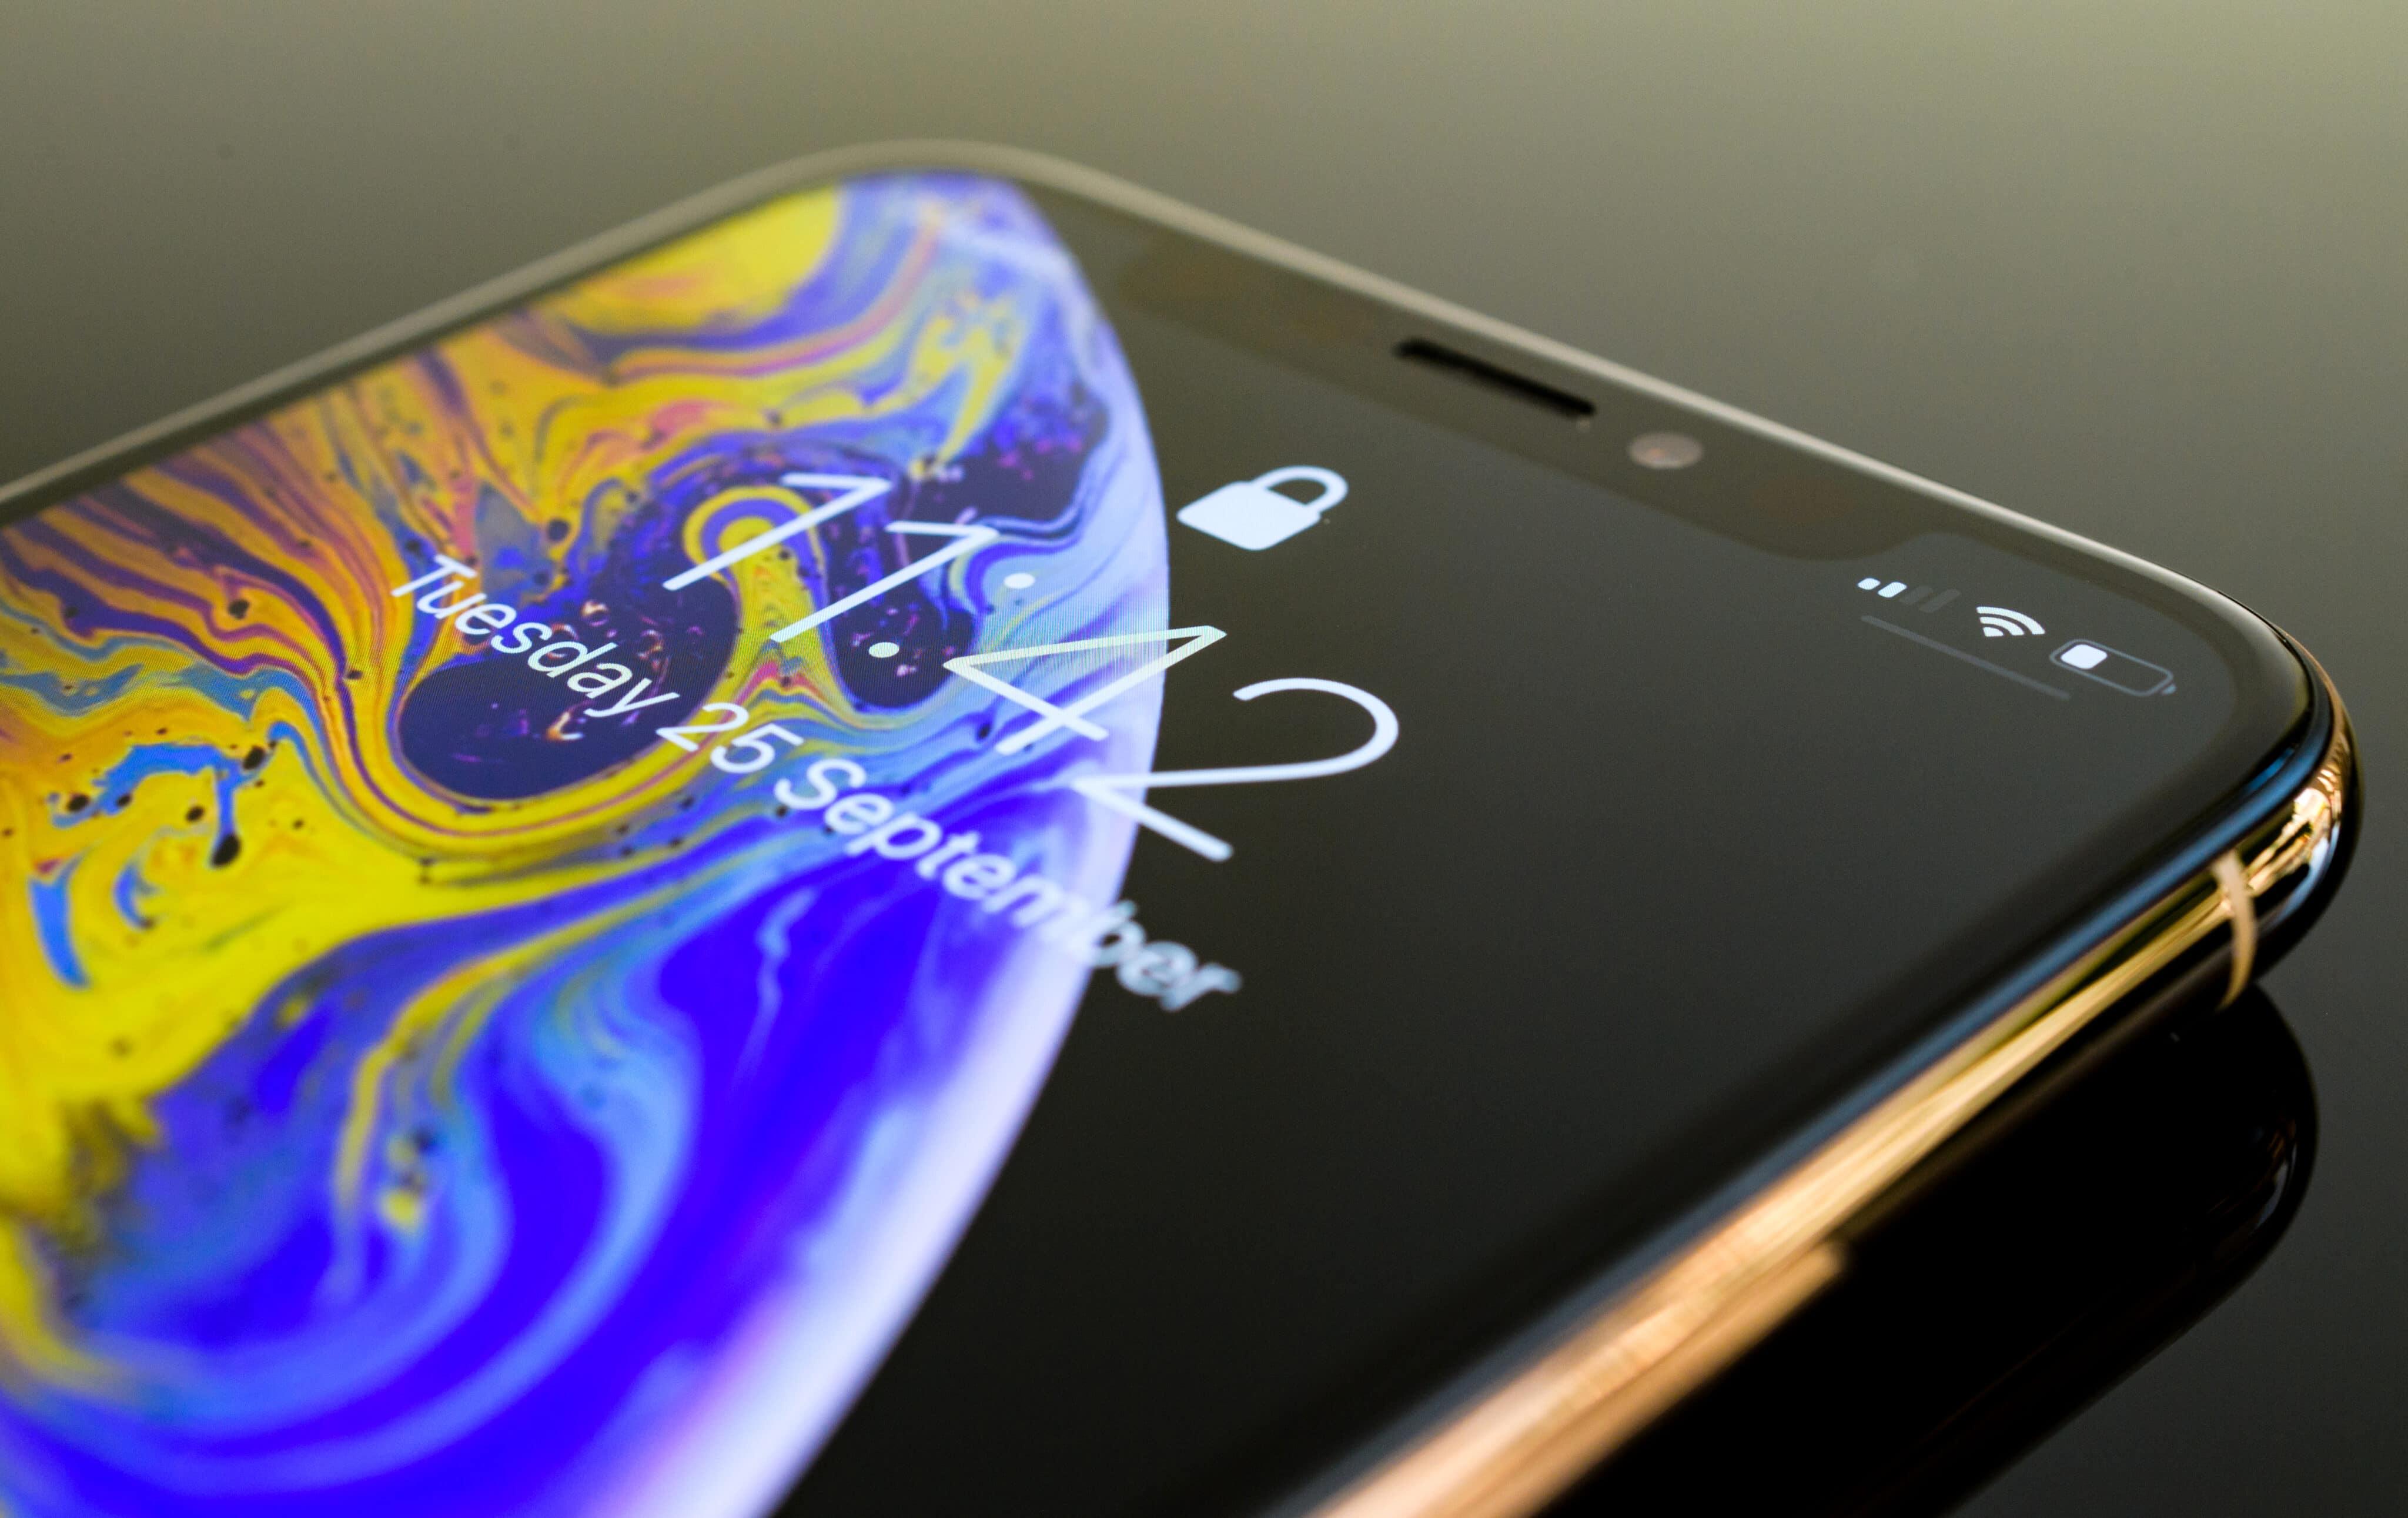 iPhone com a tela bloqueada